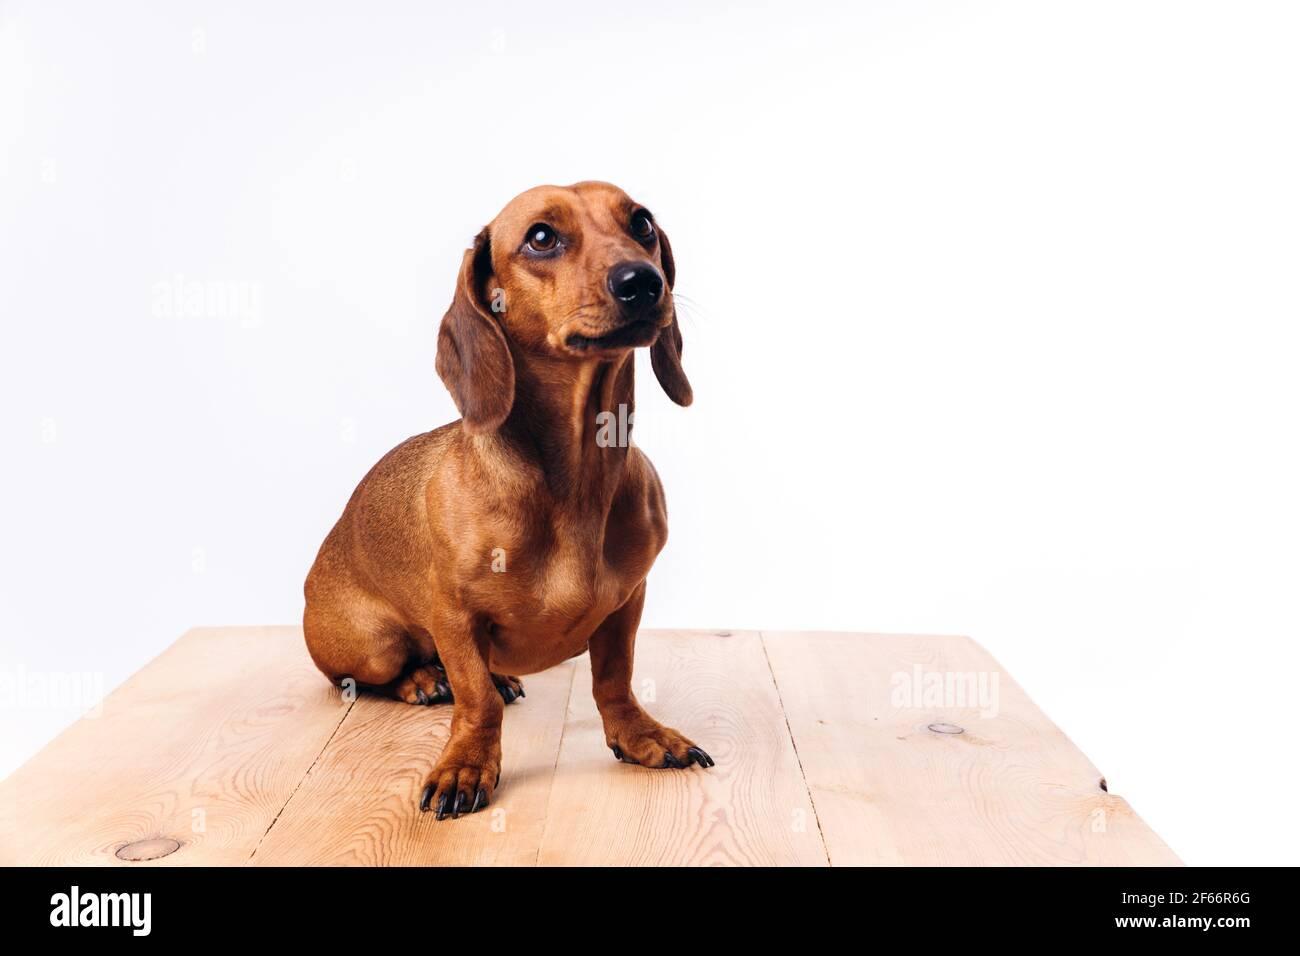 Purebred dog dachshund with shiny hair. A companion dog and a friend. Stock Photo